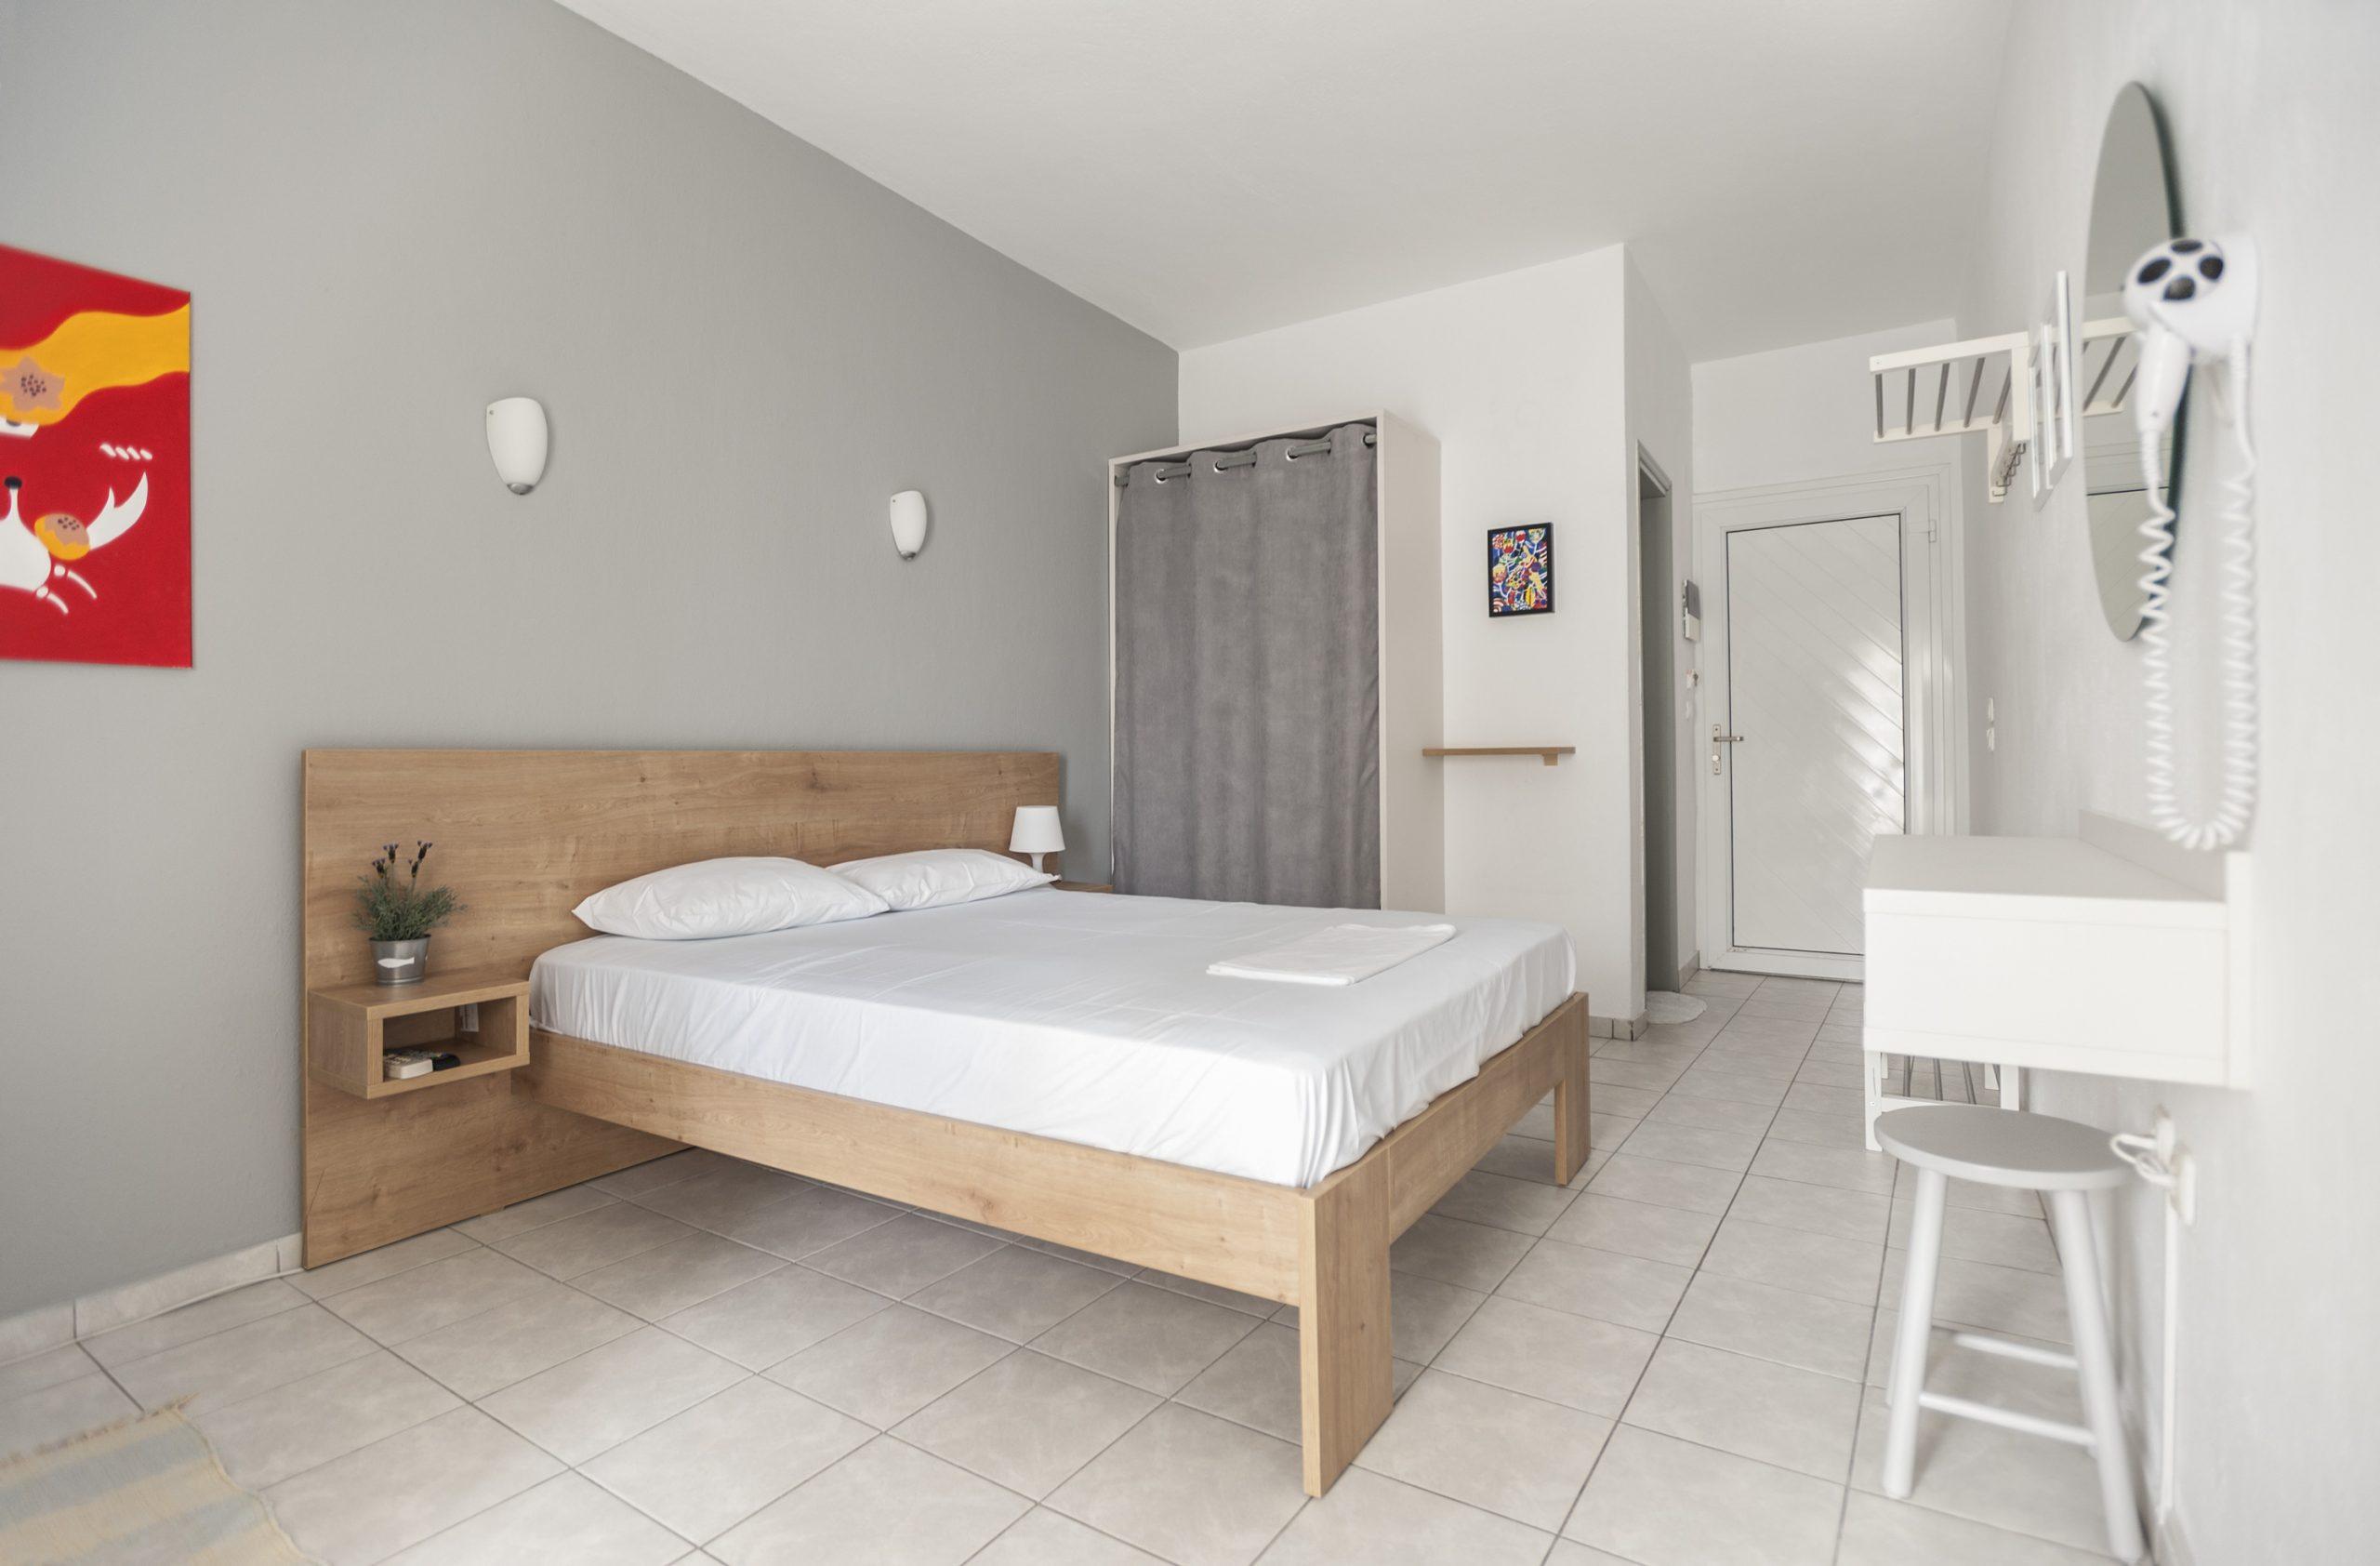 Afkos_rooms_004-1